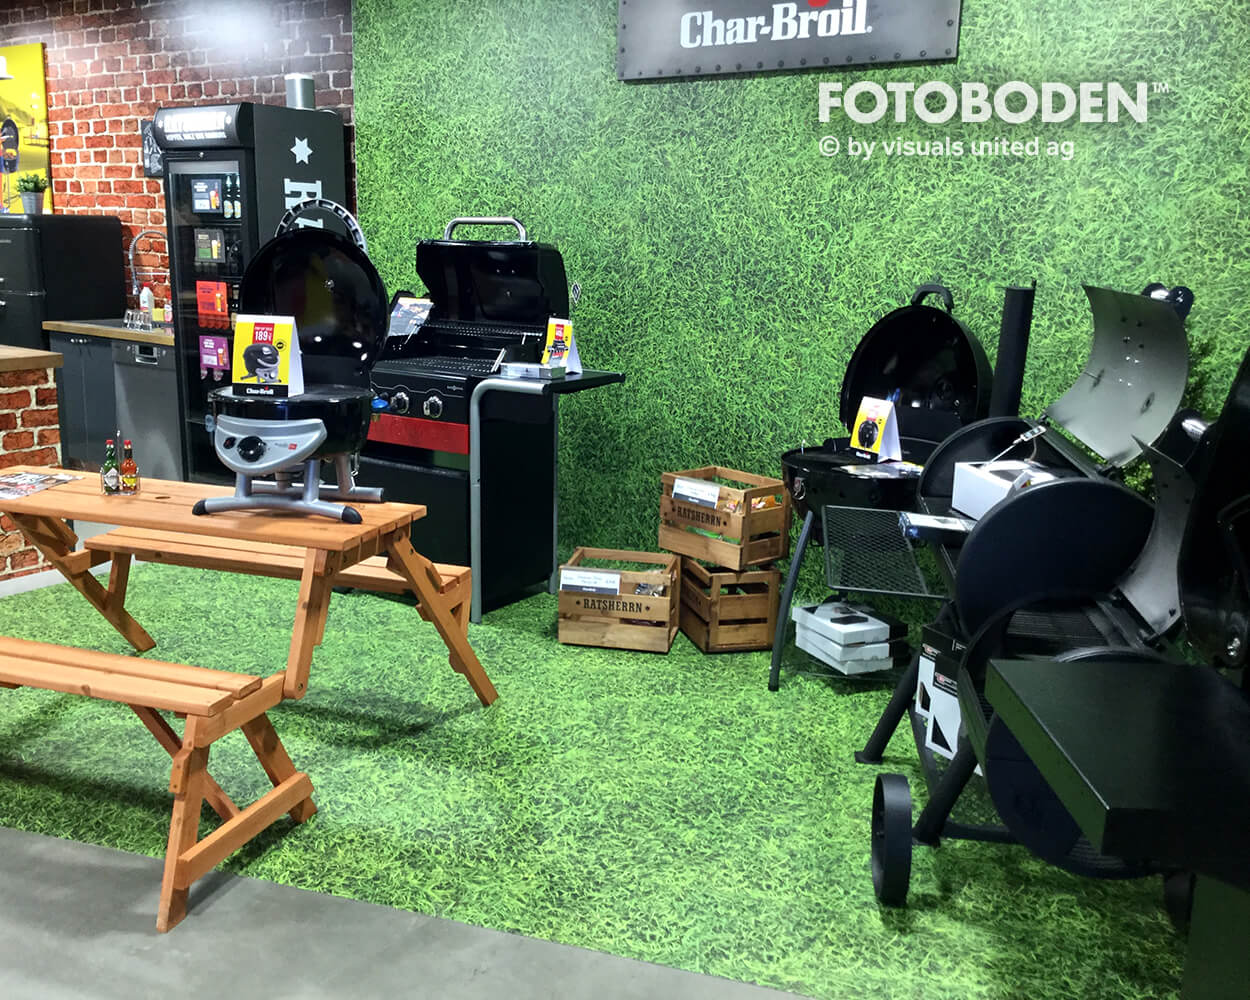 Char Broil Pop Up Fotoboden Flooring Fußboden Bodengestaltung Floorminder Bodendruck Werbung Fußbodenwerbung Bodenwerbung Merchandising Advertising Visualmerchandising  9